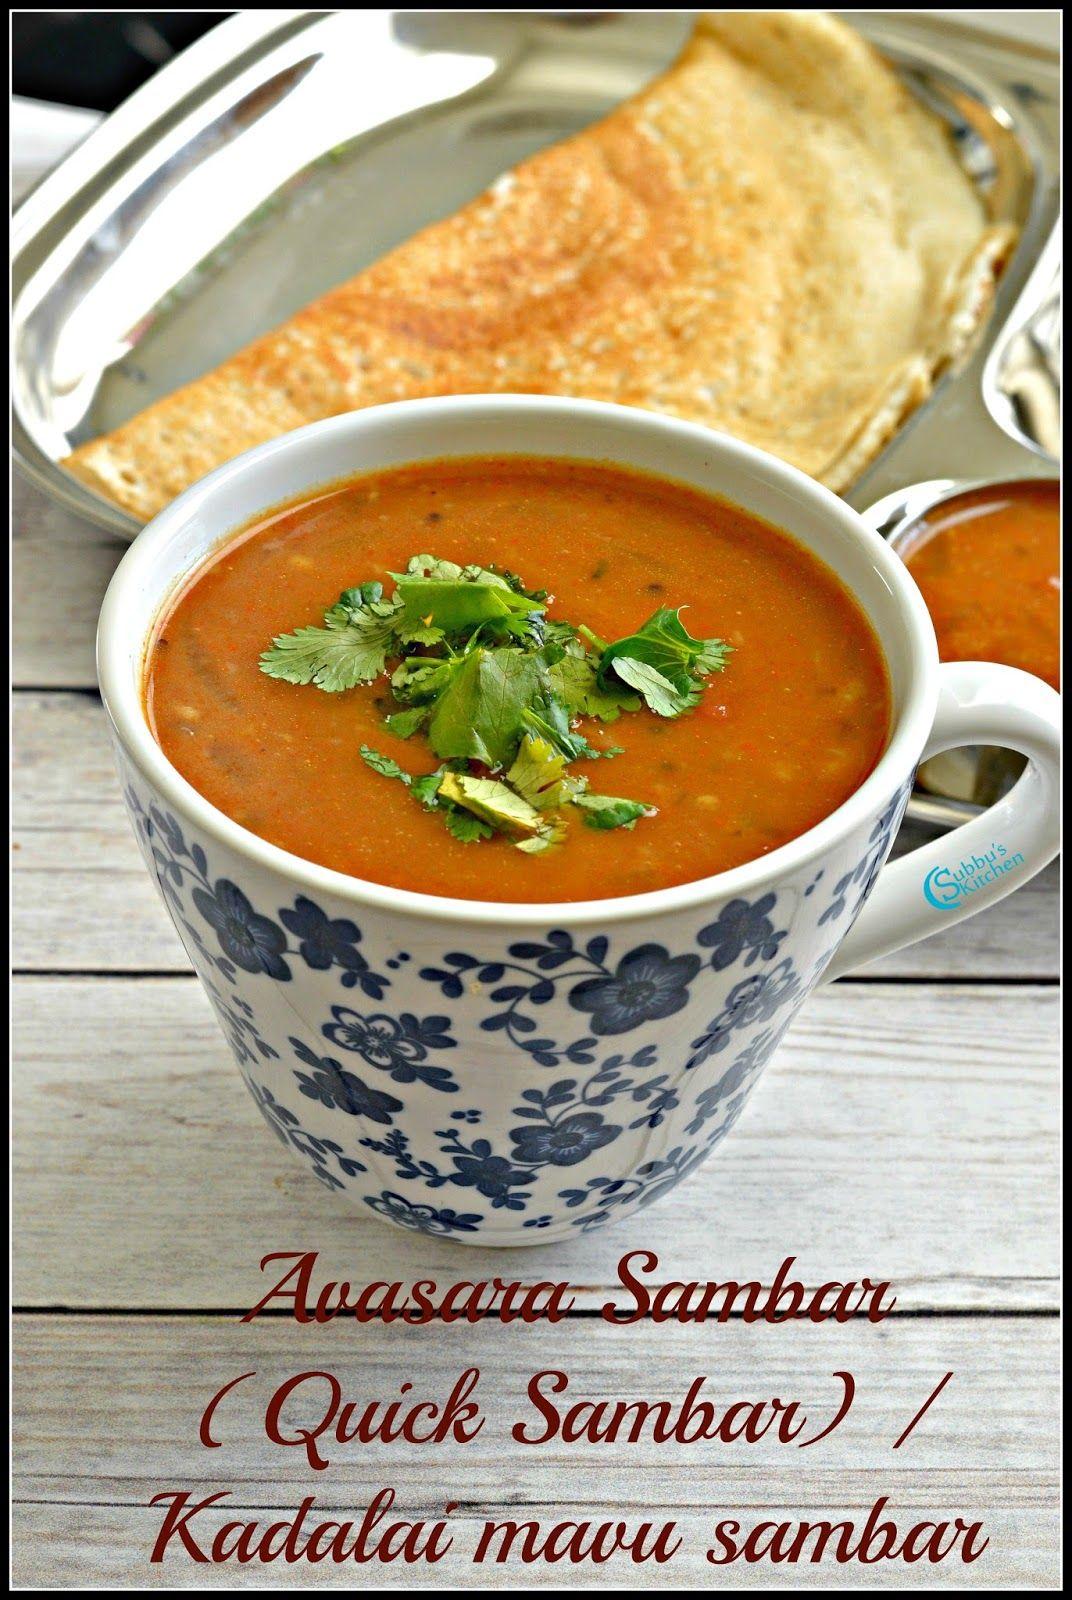 Subbus Kitchen Avasara Sambar Quick Sambar Kadalai Mavu Sambar Cooking Rasam Recipe Food